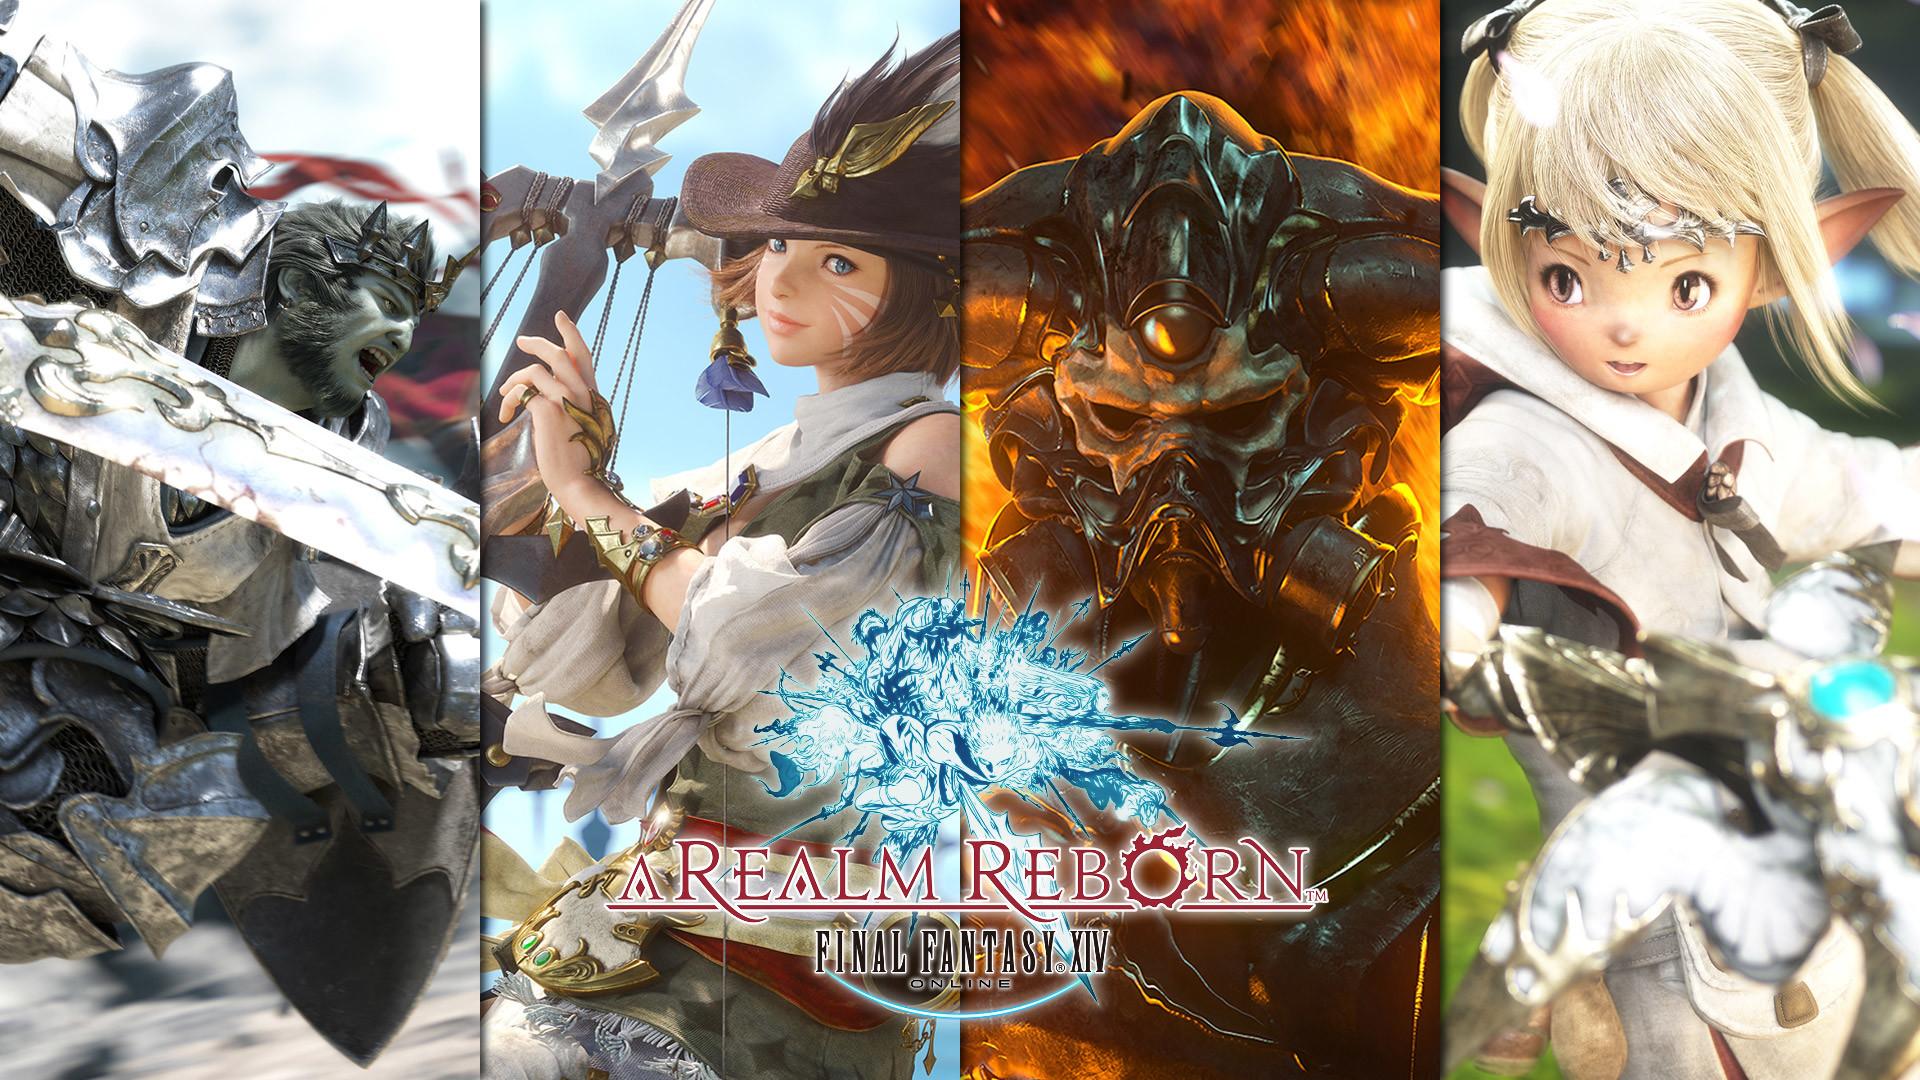 Final Fantasy XIV A Realm Reborn Computer Wallpapers Desktop | HD Wallpapers  | Pinterest | Final fantasy, Hd wallpaper and Finals